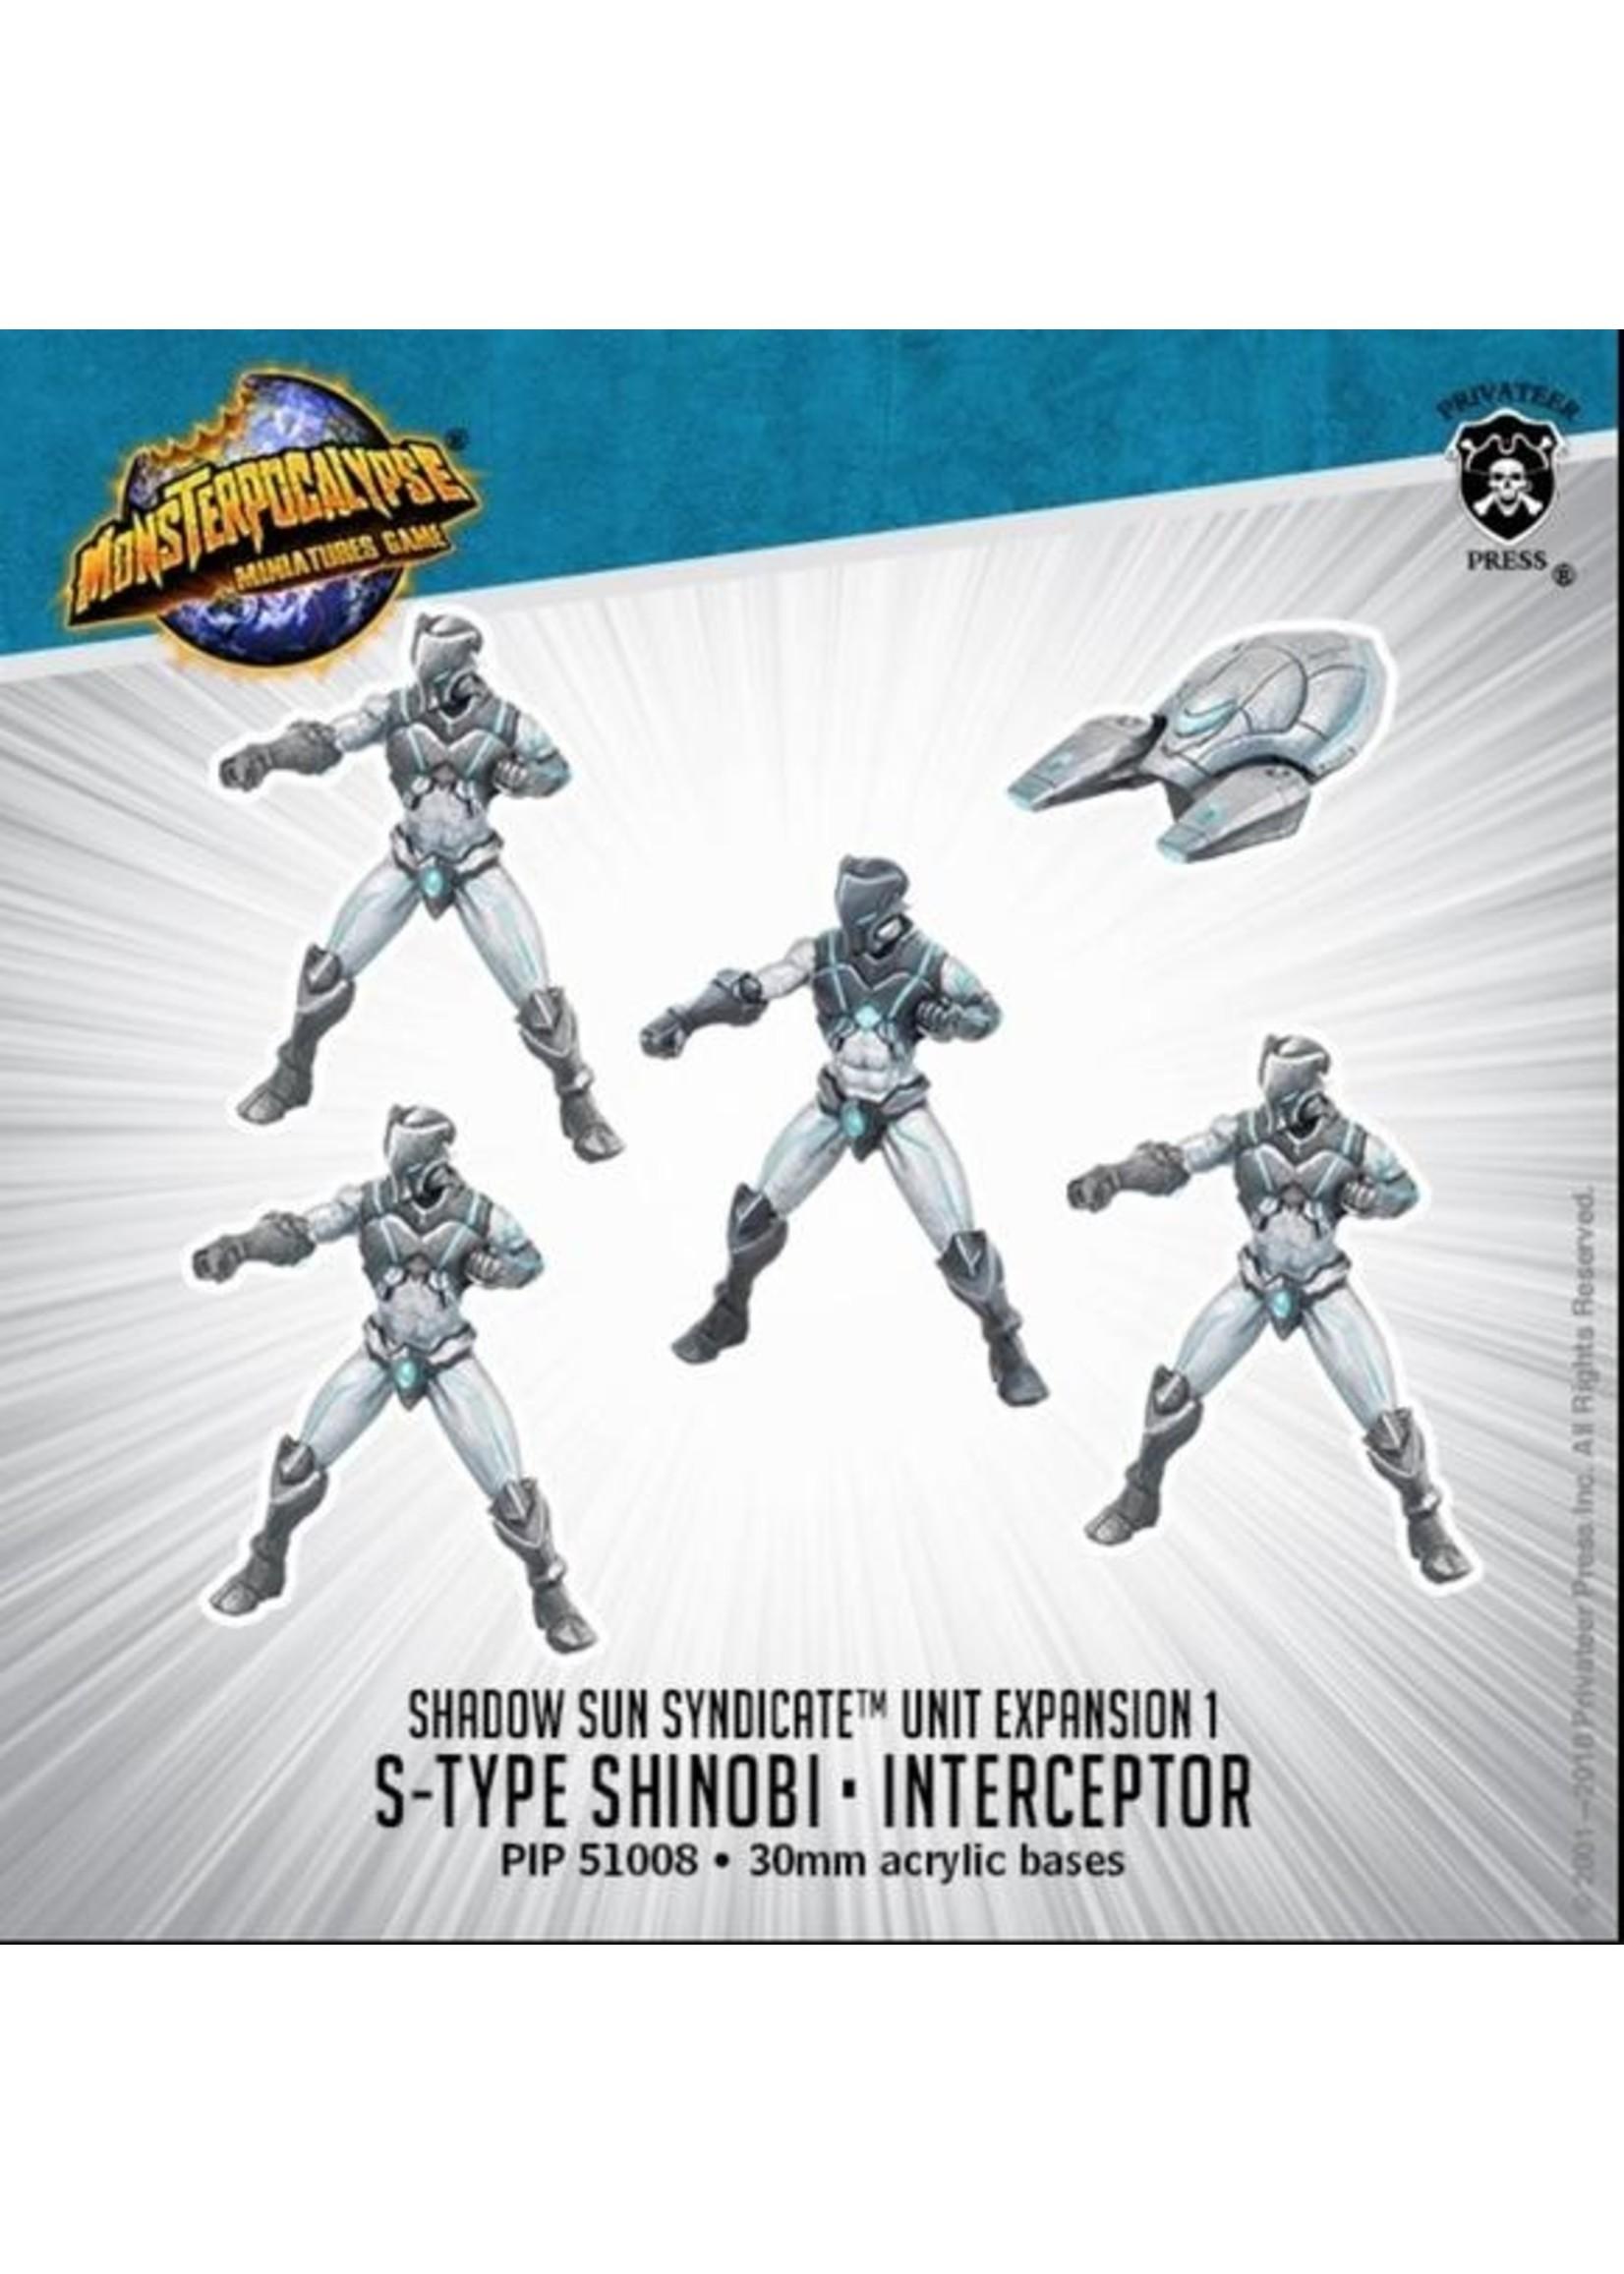 Monsterpocalypse: Shadow Sun Syndicate S-Type Shinobi & Interceptor Unit (Resin and White Metal)